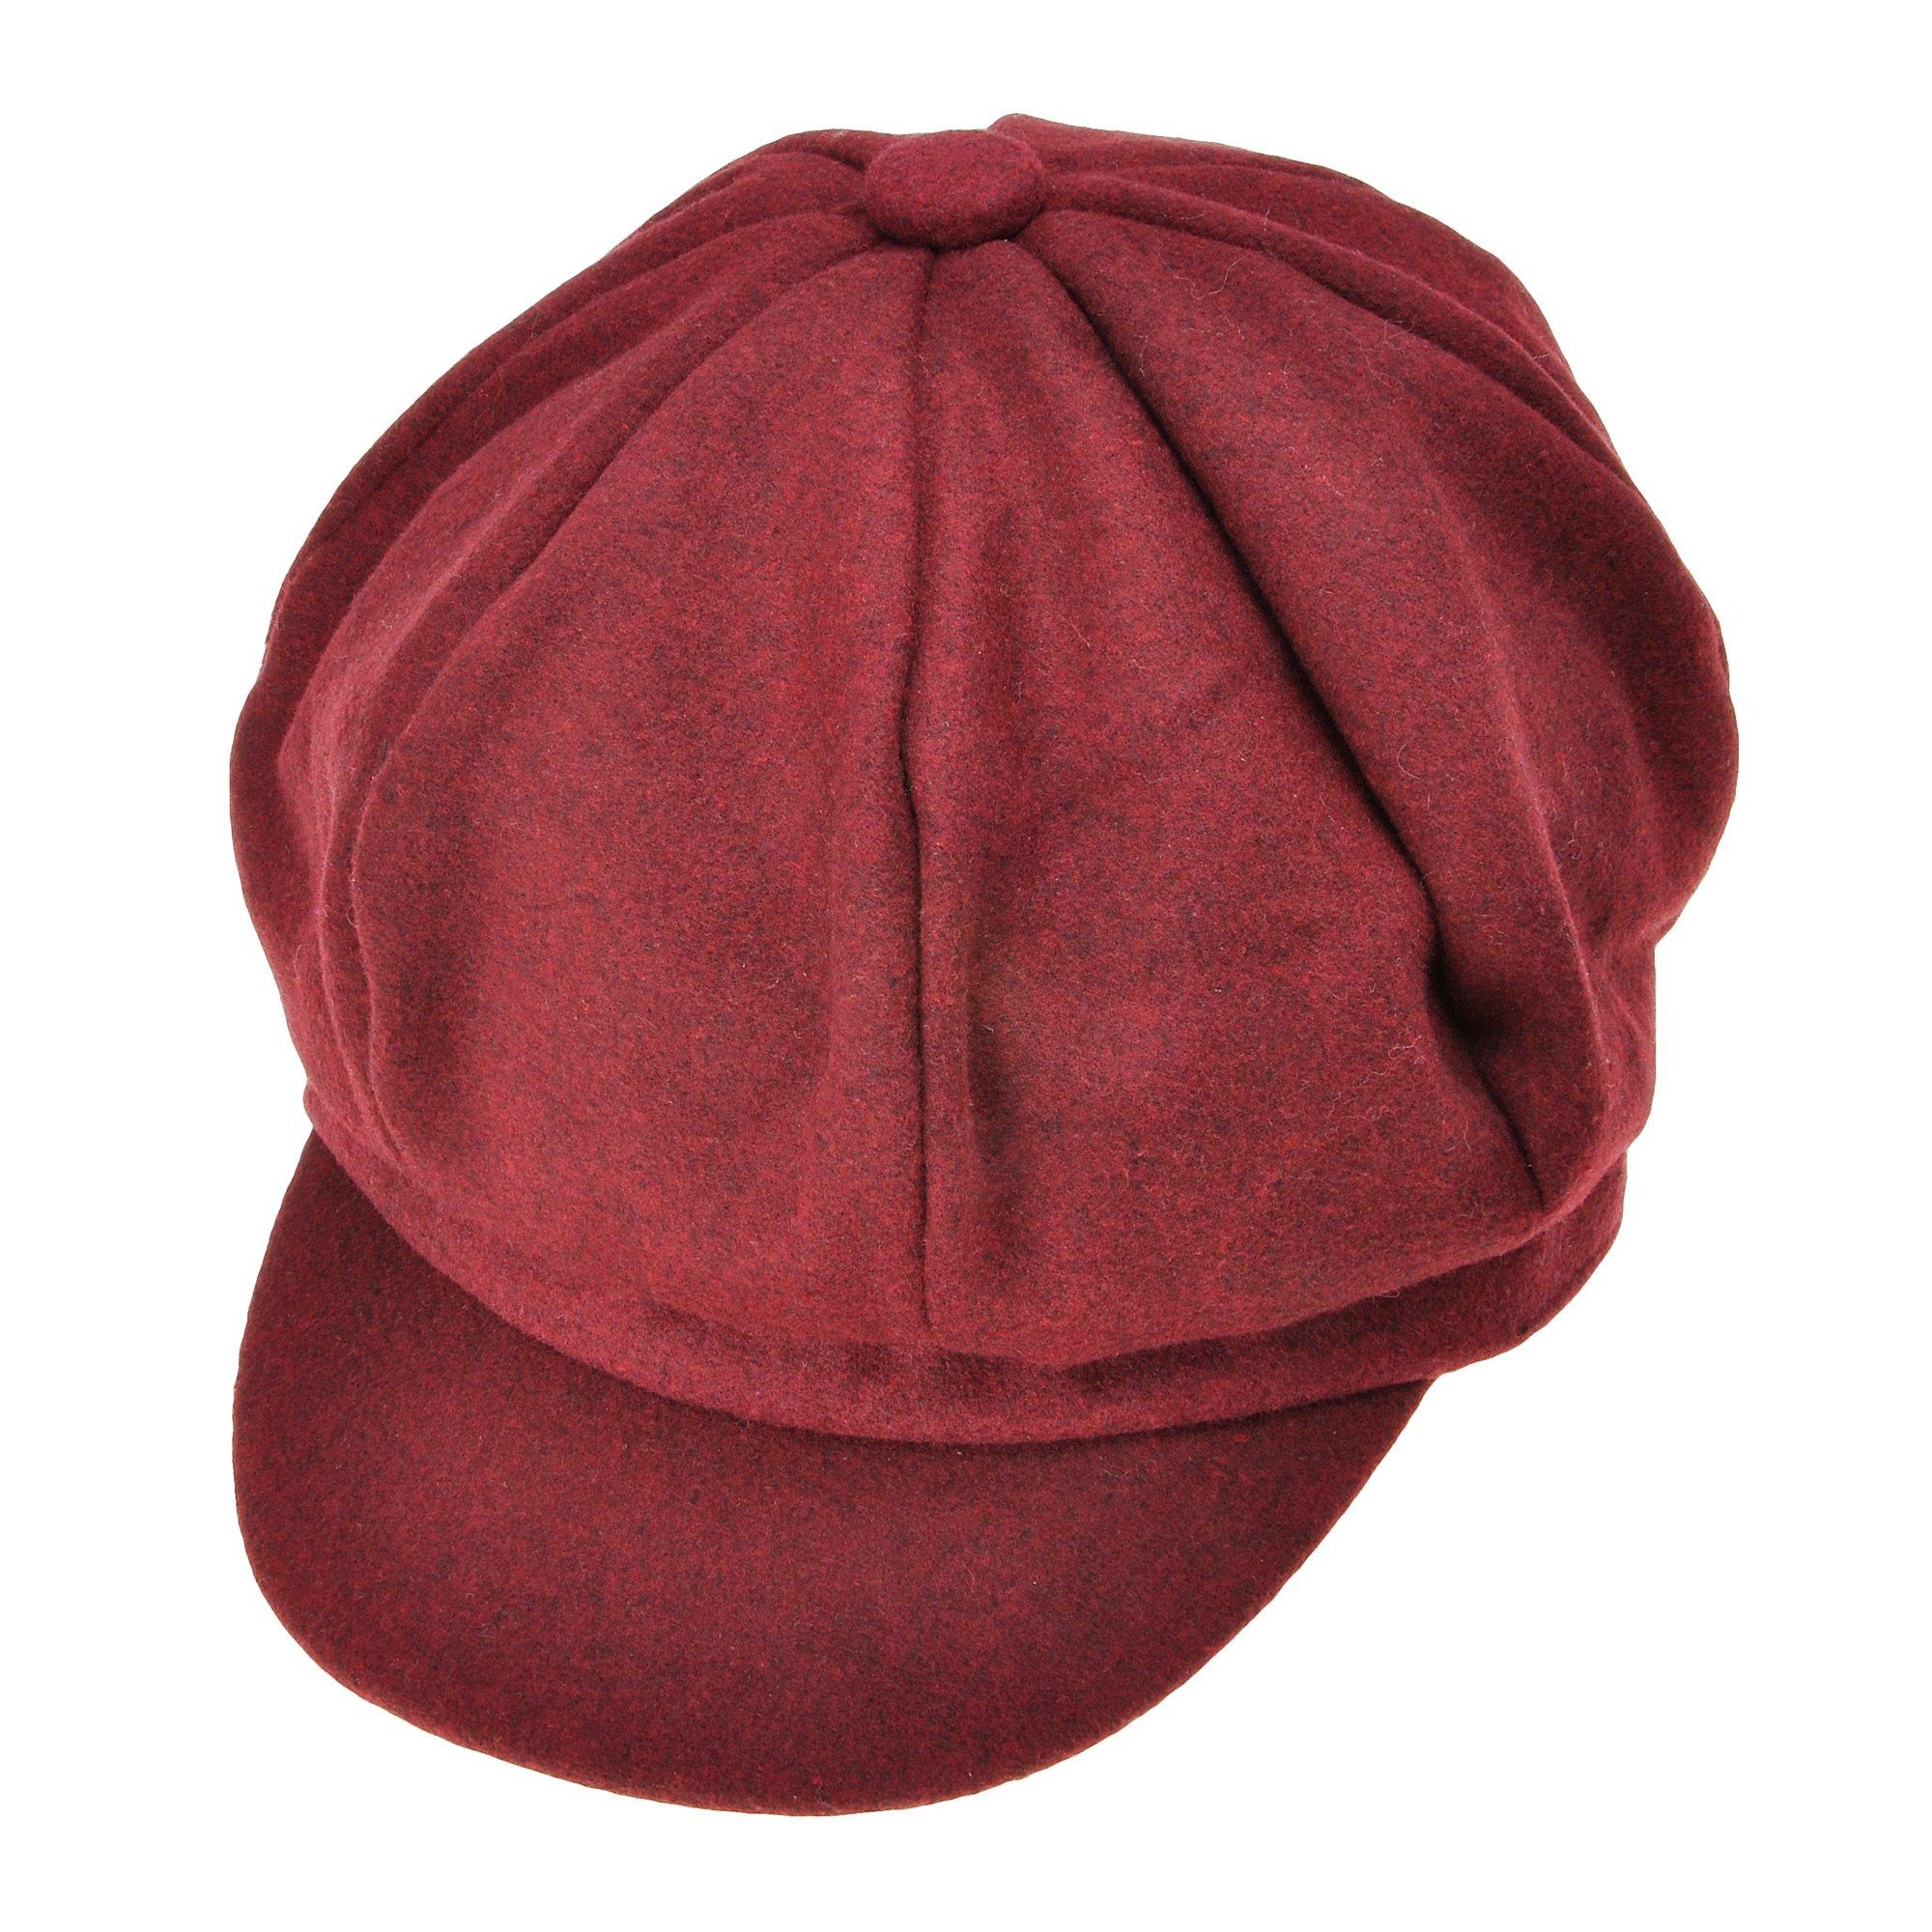 Womens Classic Newsboy Caps Visor 8 Panel Gatsby Apple Cabbie Hat, Burgundy